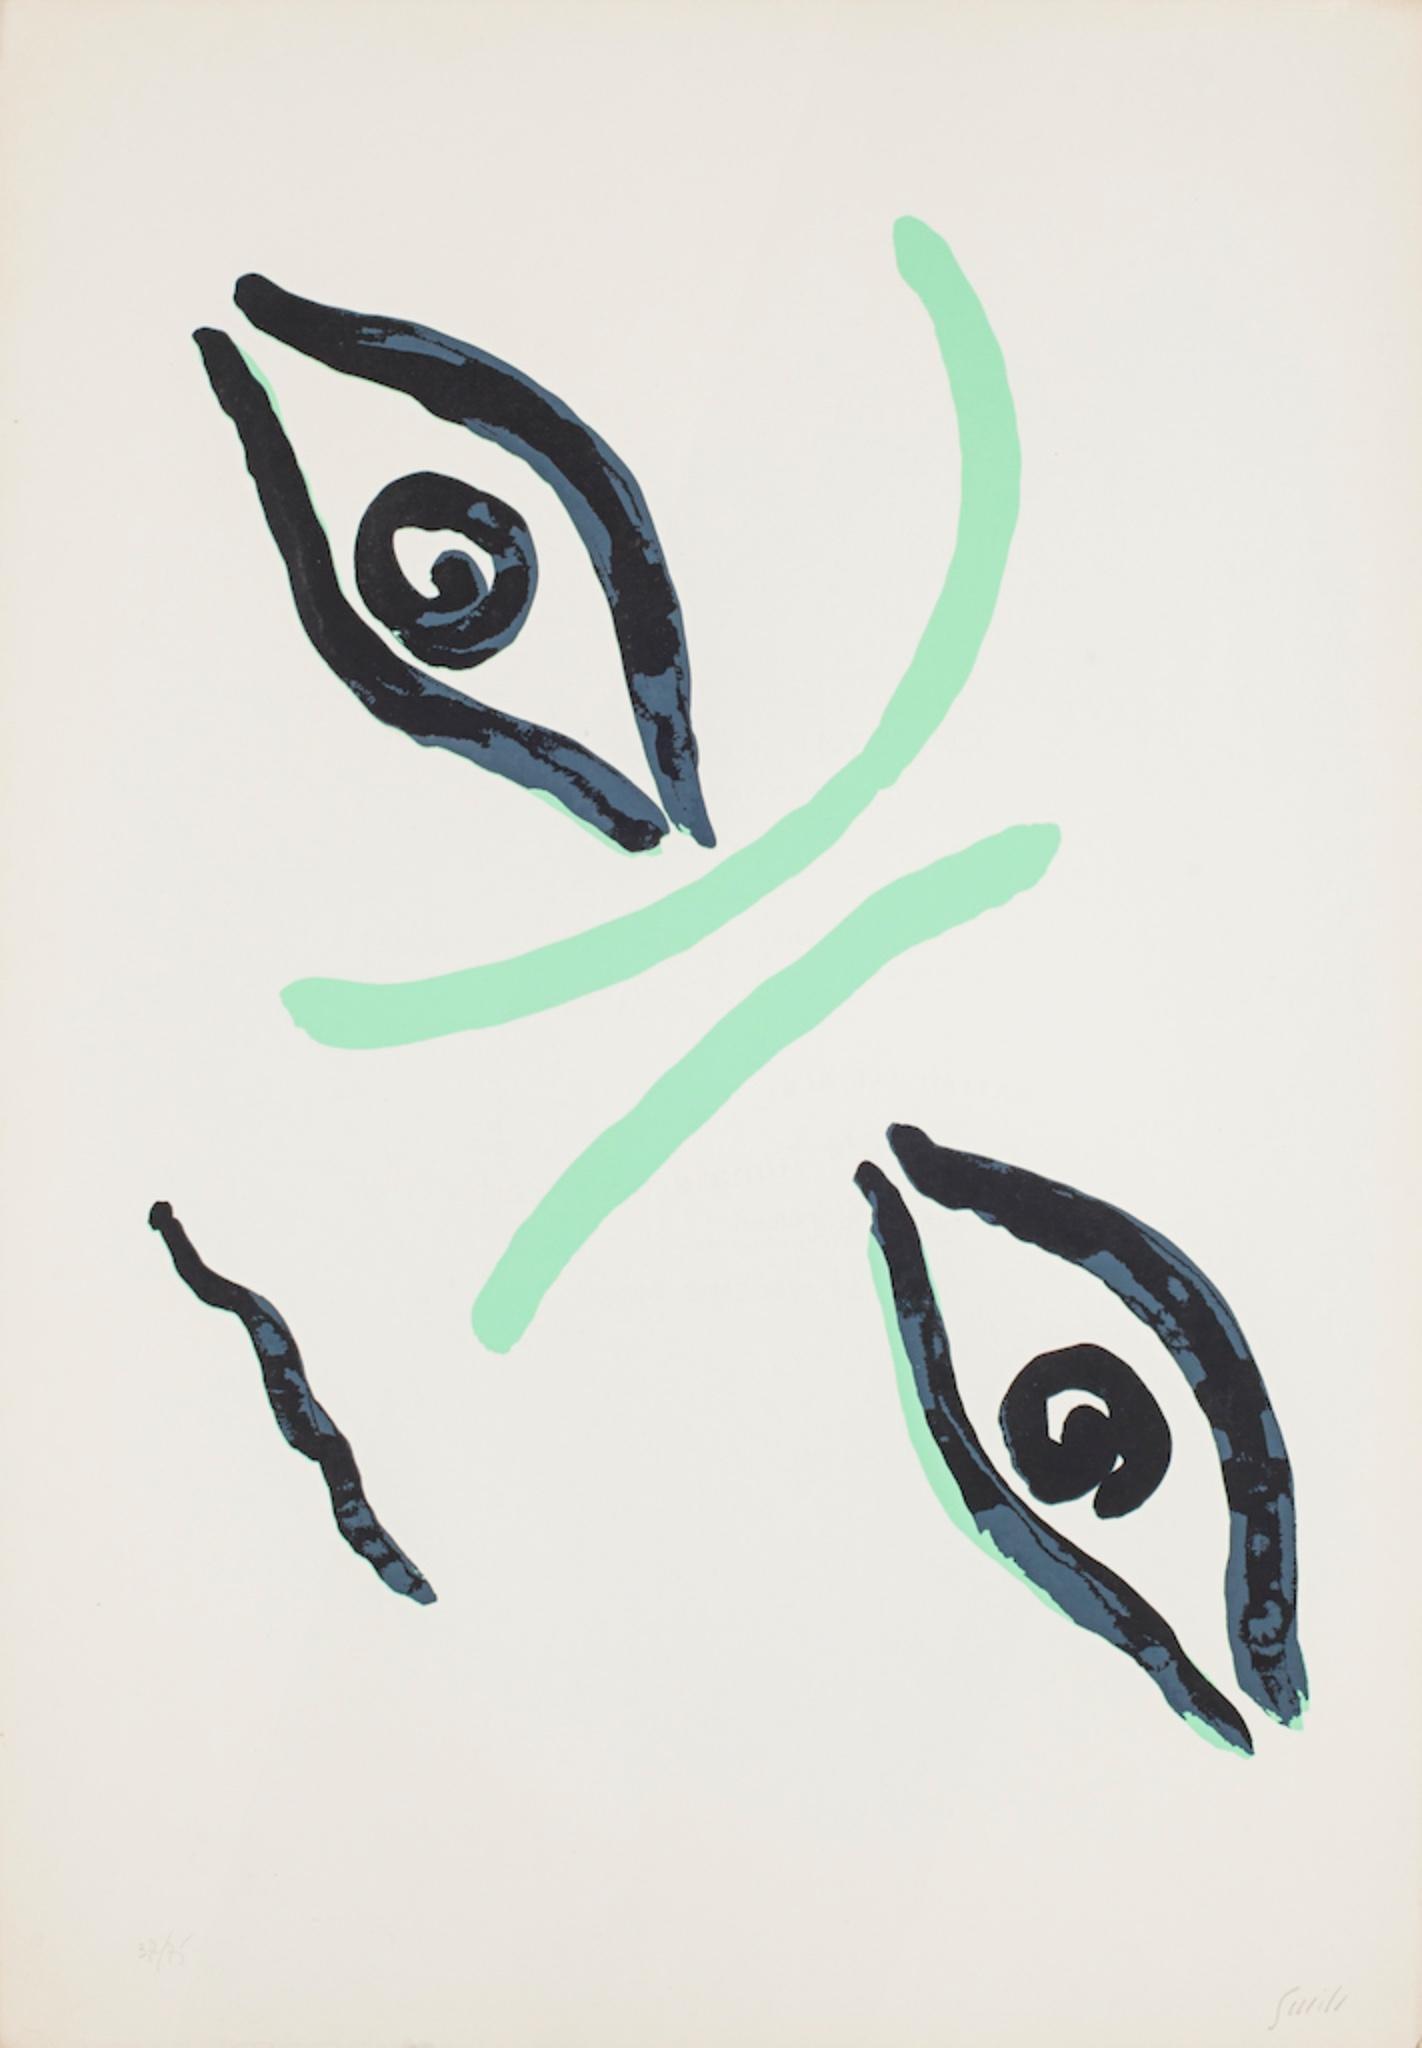 Countess Portrait - Original Lithograph by Virgilio Guidi - 1960s